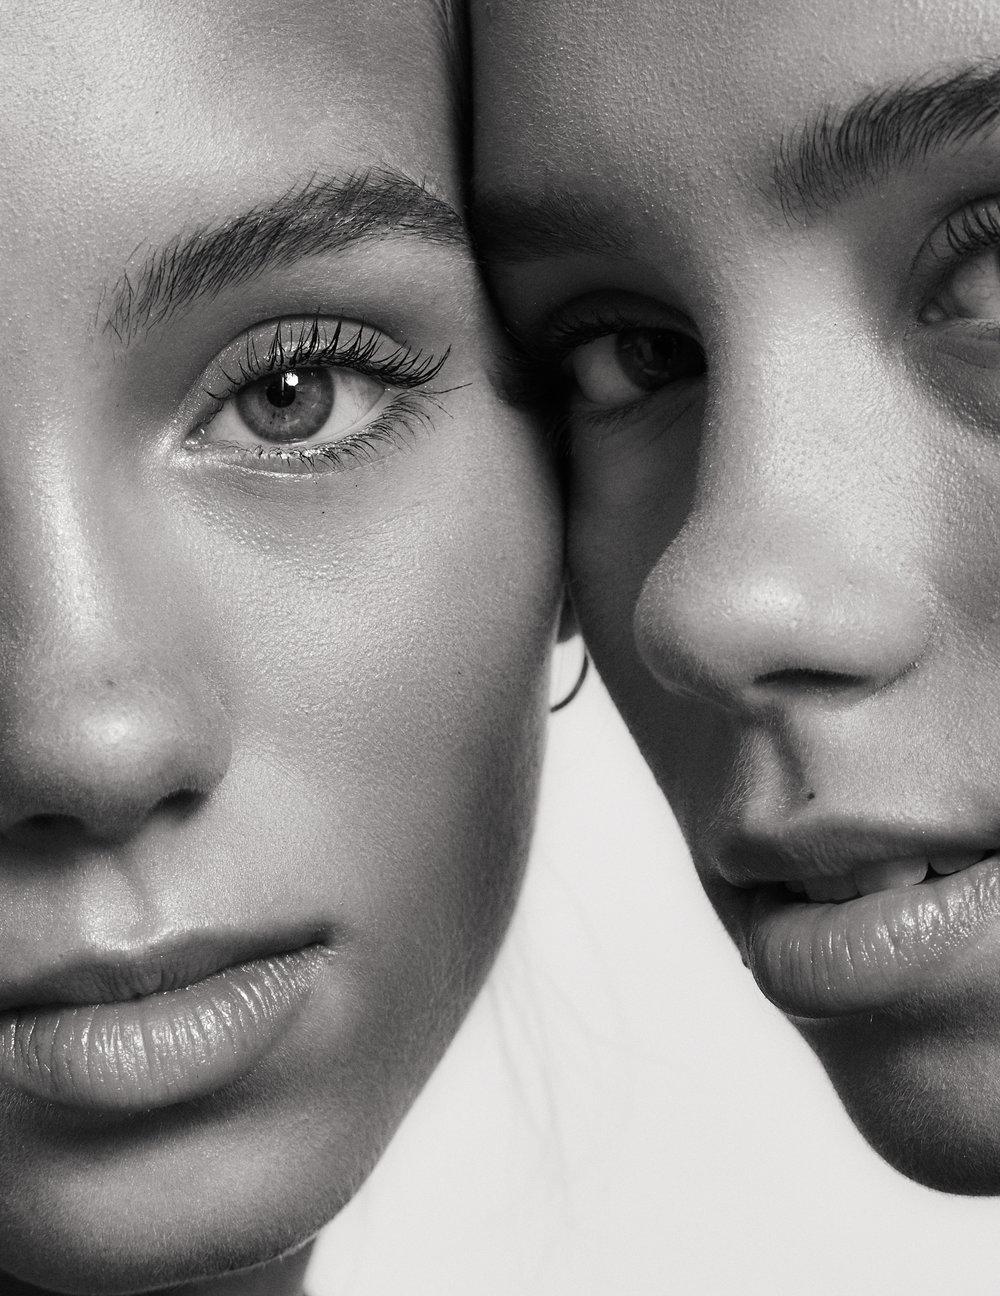 Lisa&Lena_Page_01.jpg